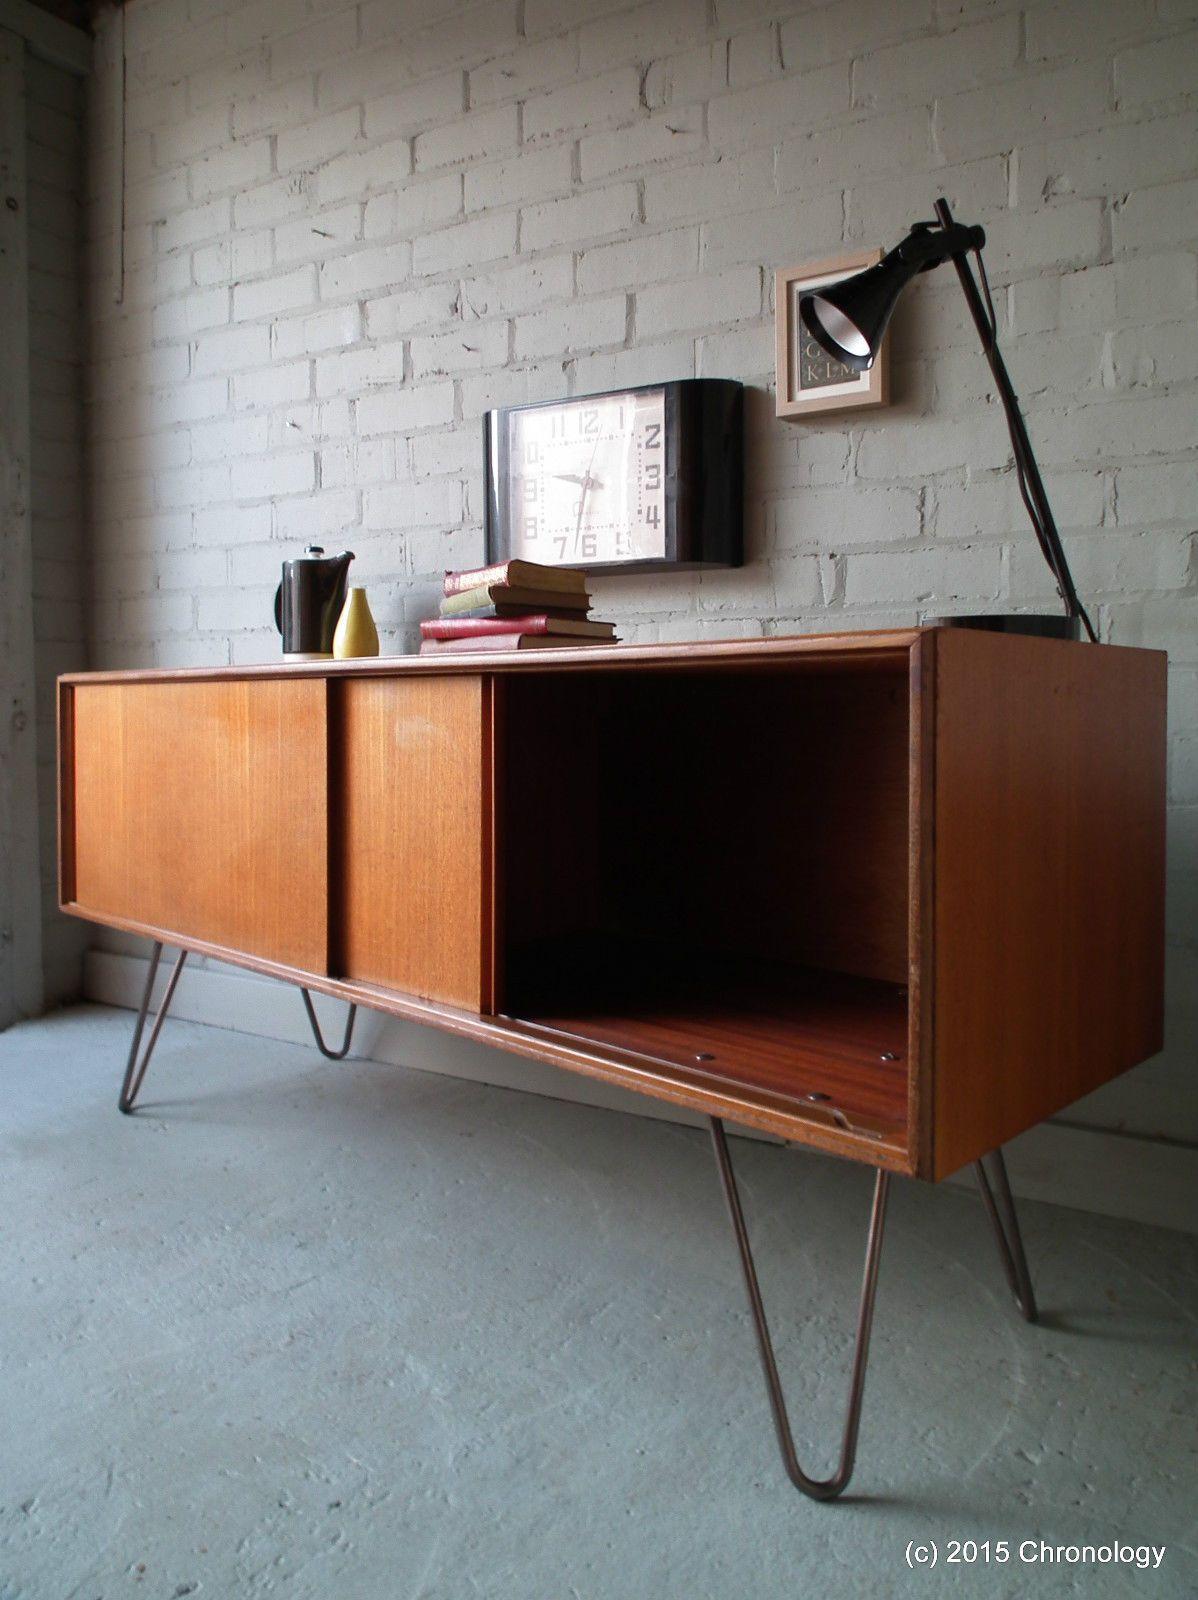 Vintage Retro Teak 60s G Plan Sideboard Industrial Hairpin Legs Danish Nathan Ebay